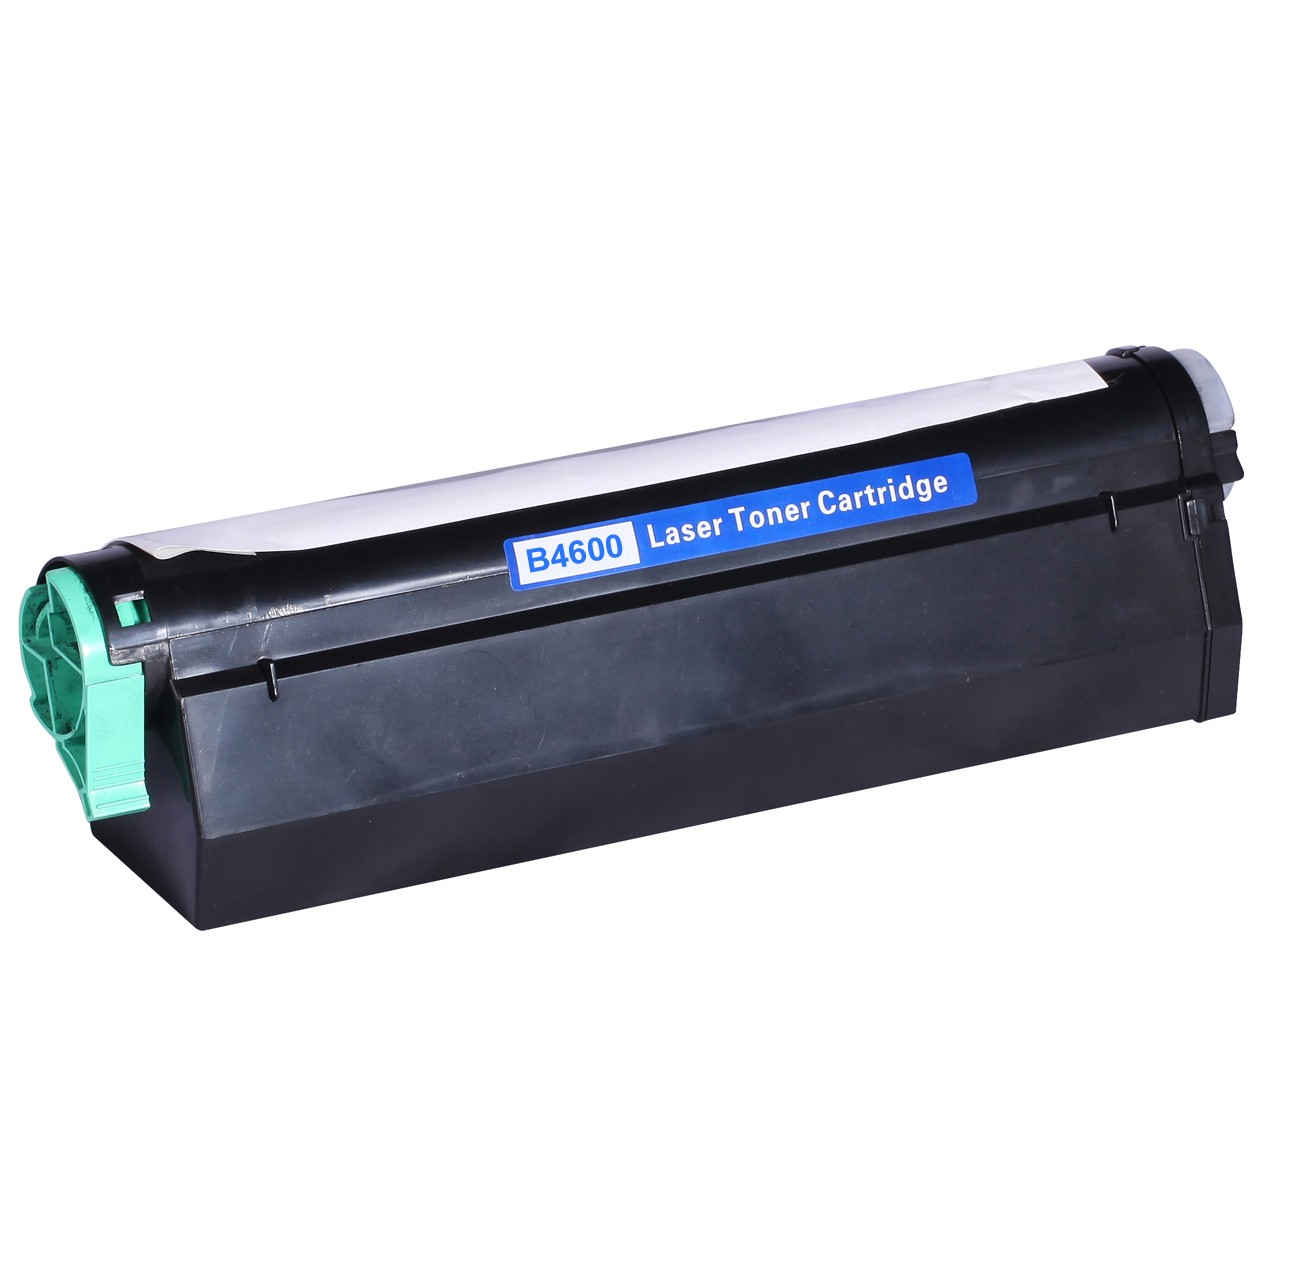 OKI B4600(43502001/ 43502002 ) Lasertoner, Sort, Kompatibel, 7000 sider